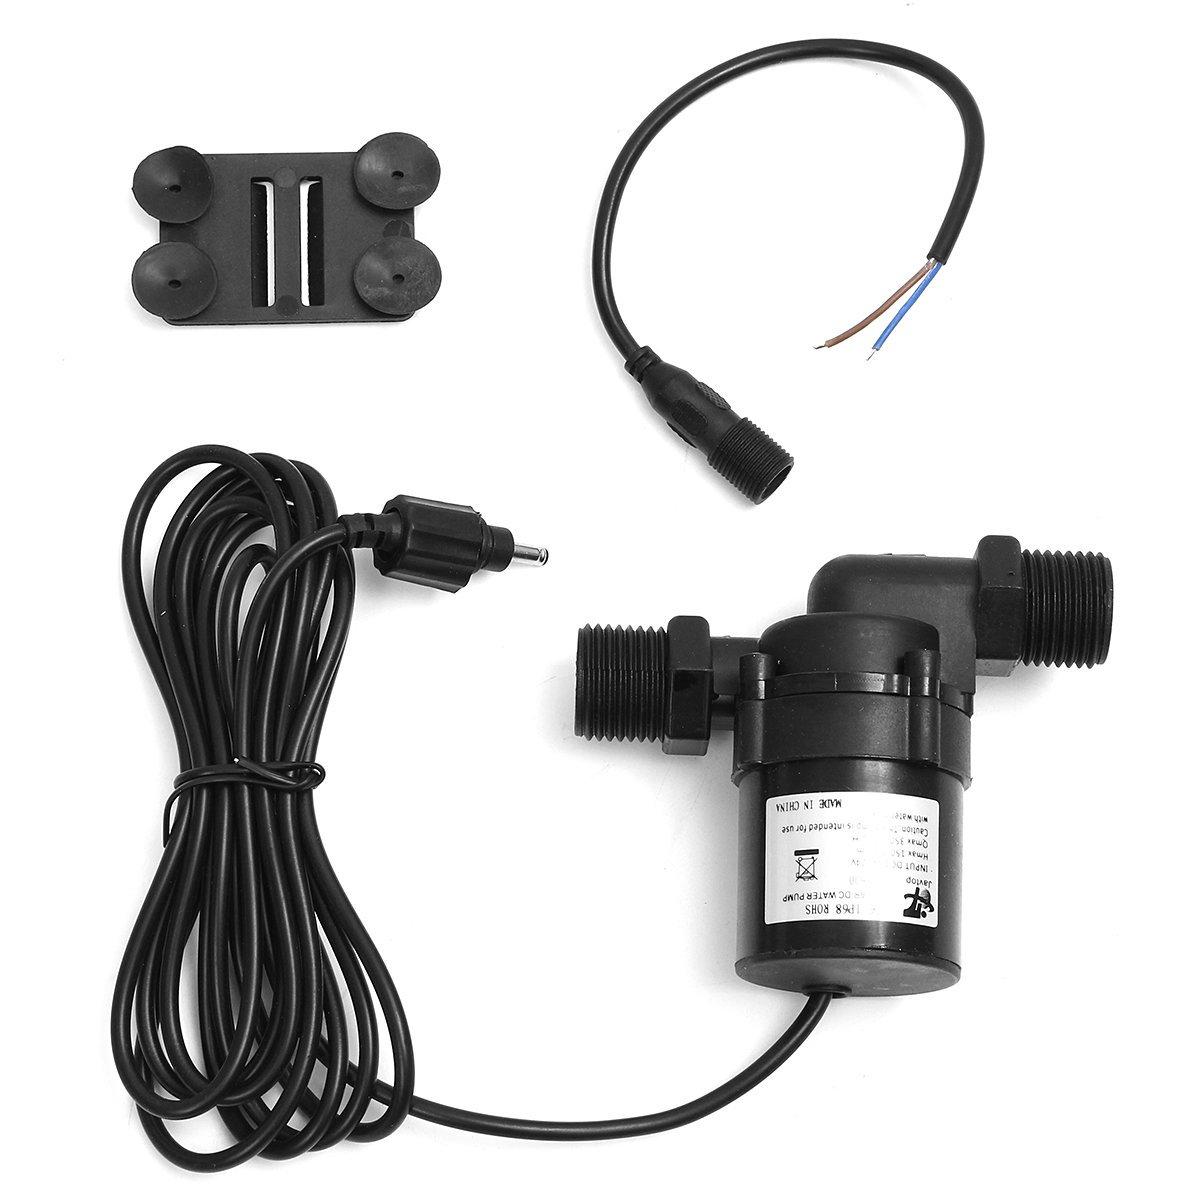 Mini Solar DC 12V-24V 700L/H Hot Water Circulation Brushless Motor Pump Washing